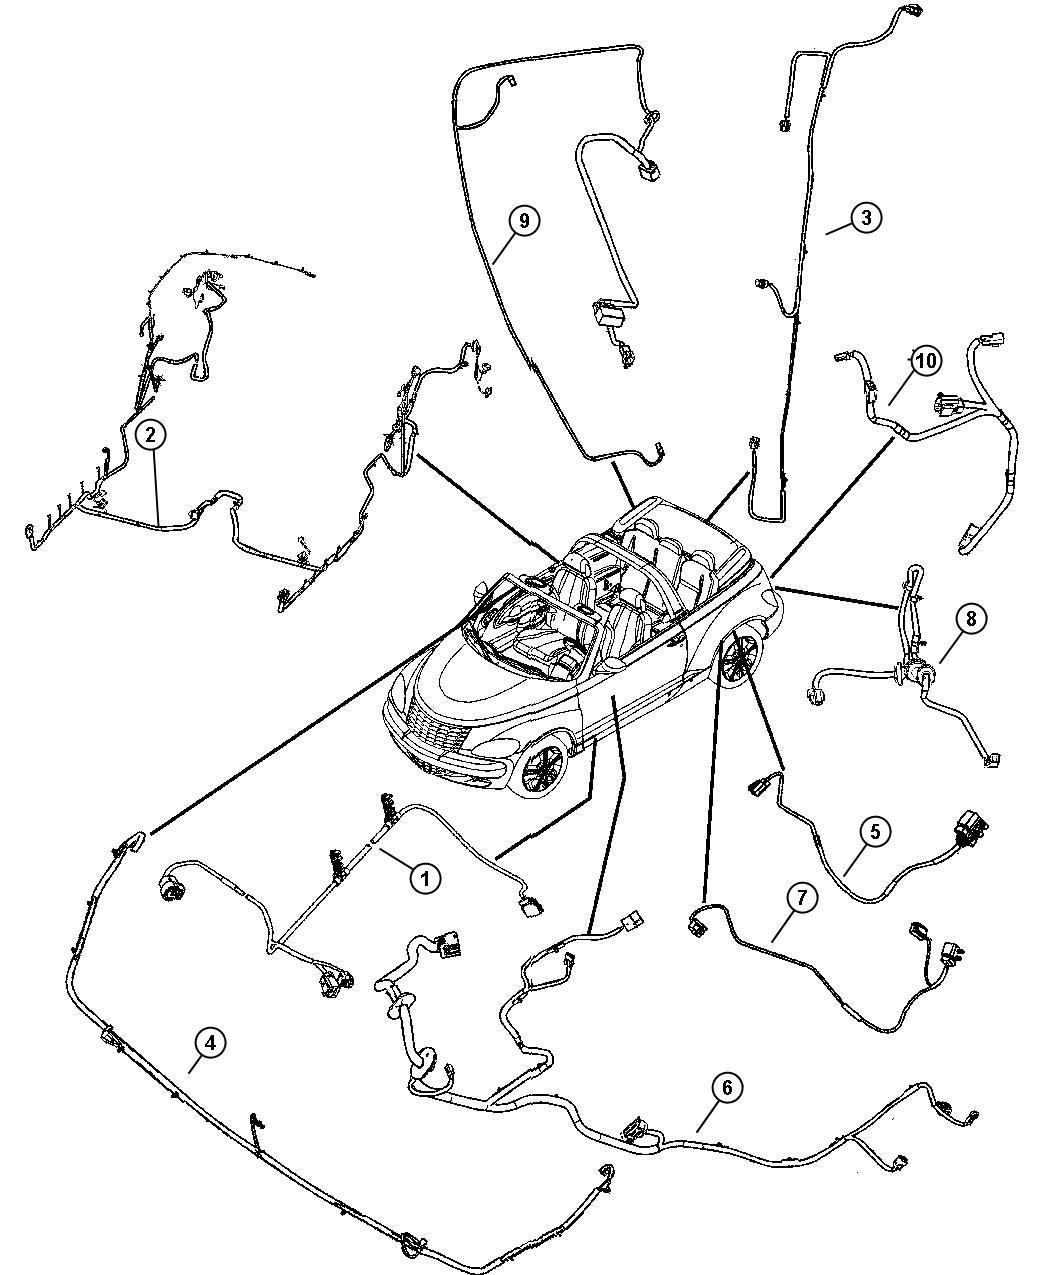 Chrysler Pt Cruiser Wiring Deck Lid